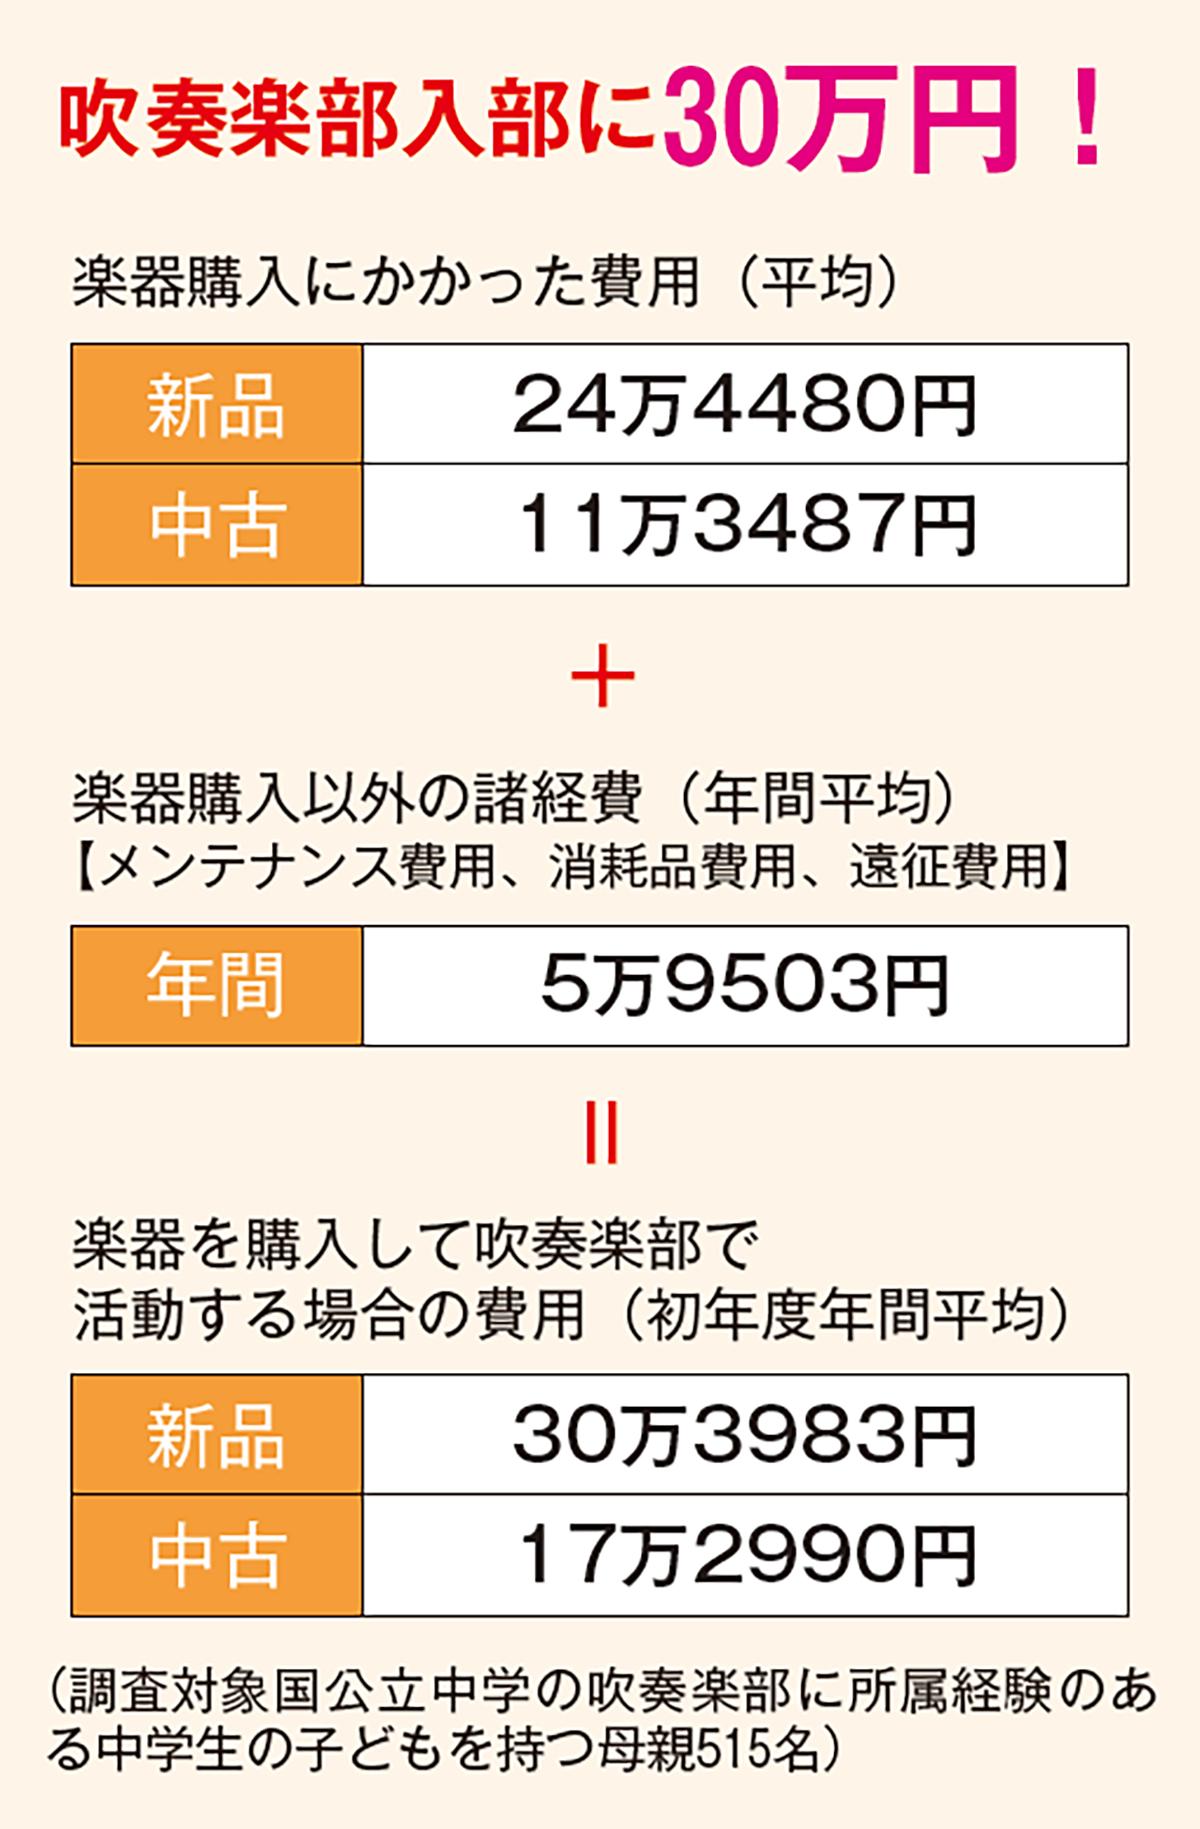 吹奏楽部入部に30万円